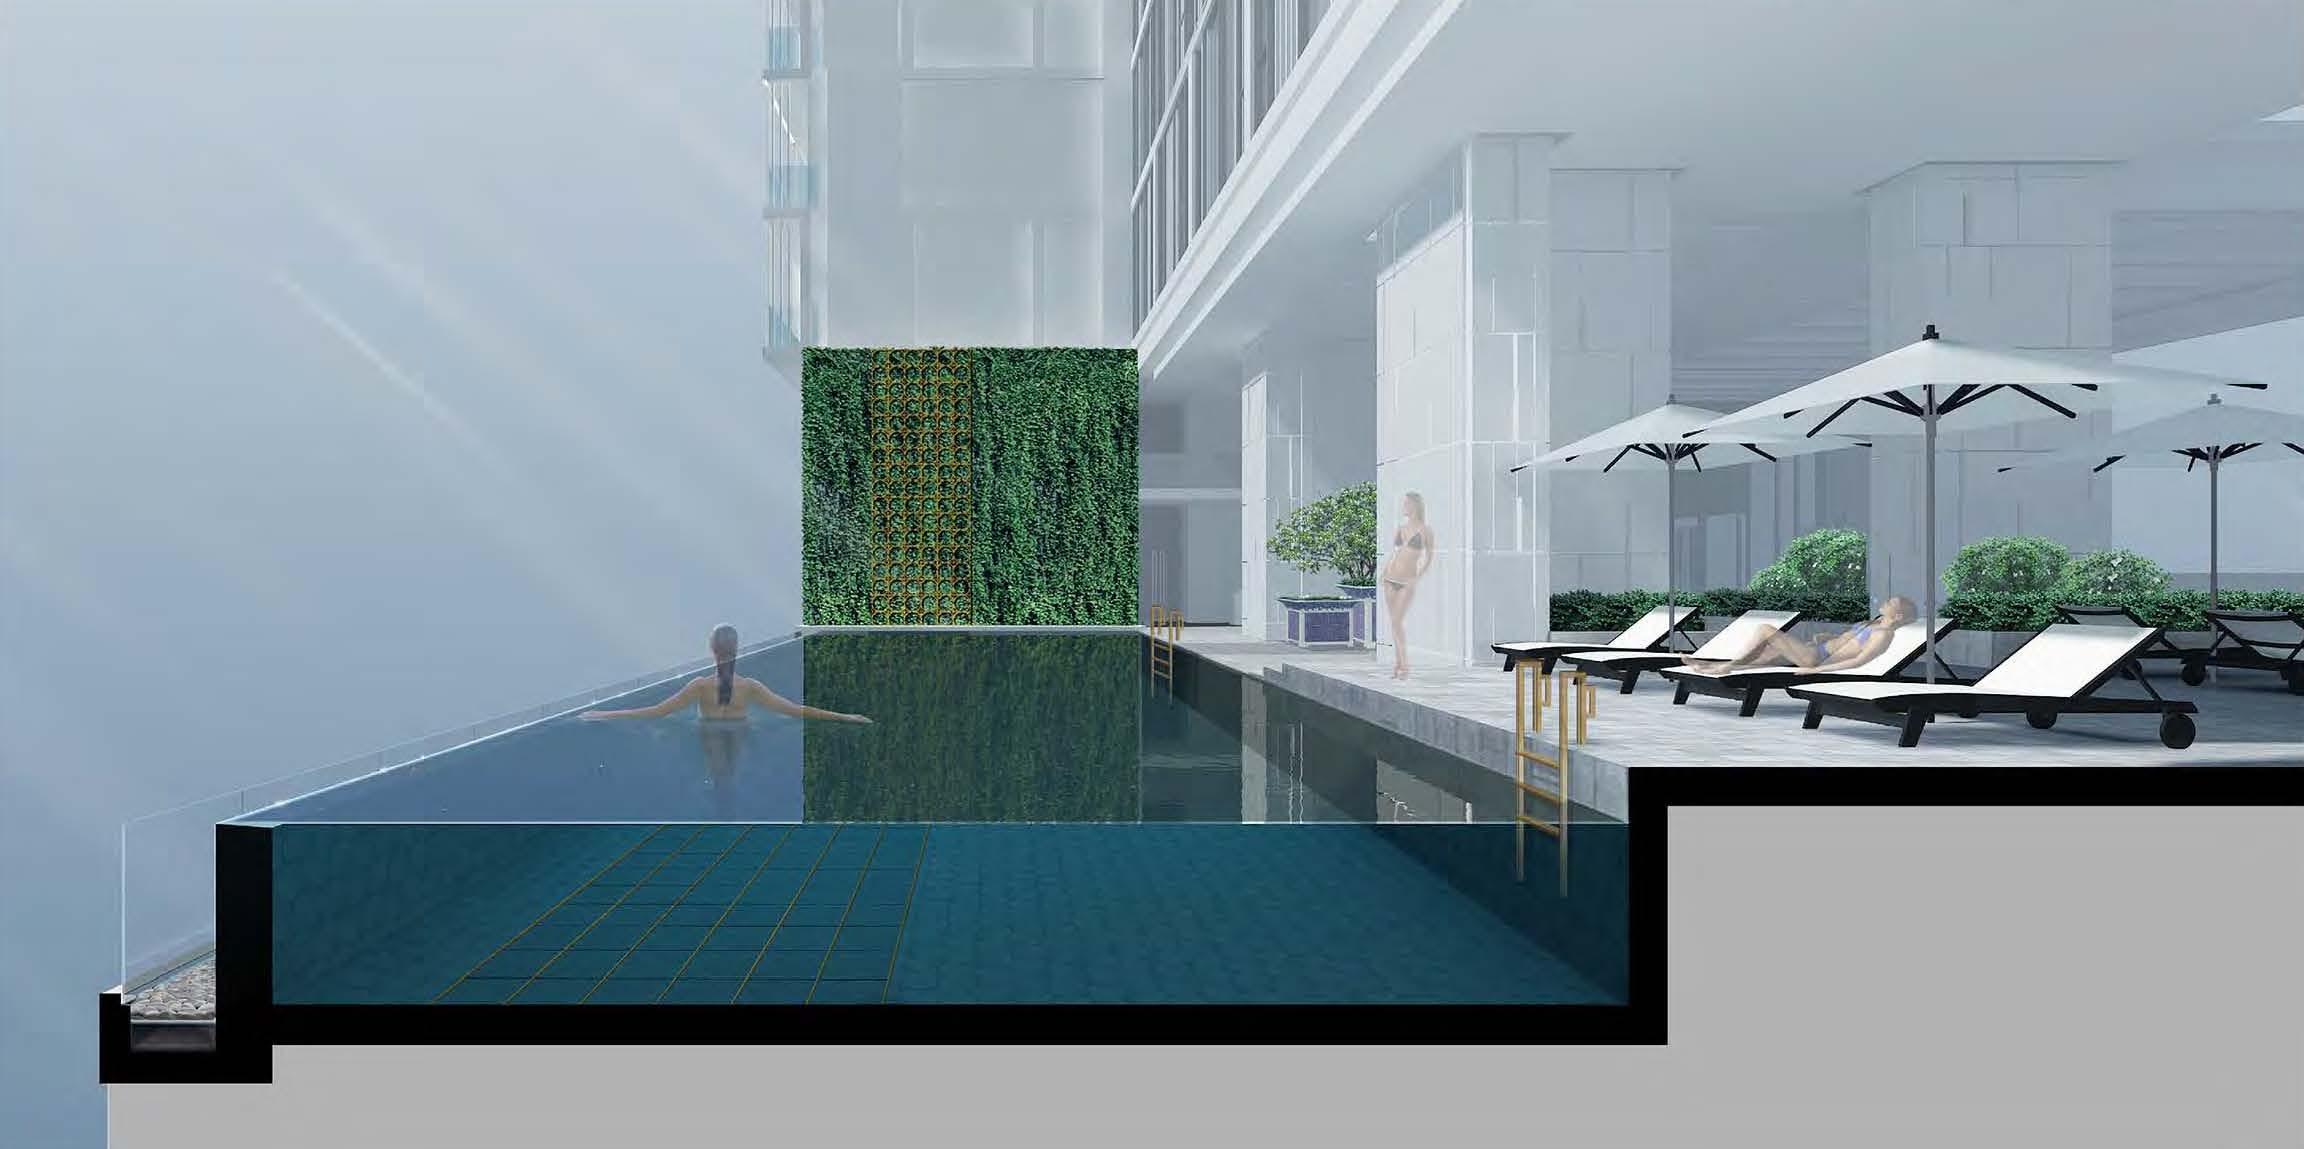 03 Level 26 swimming pool.jpg